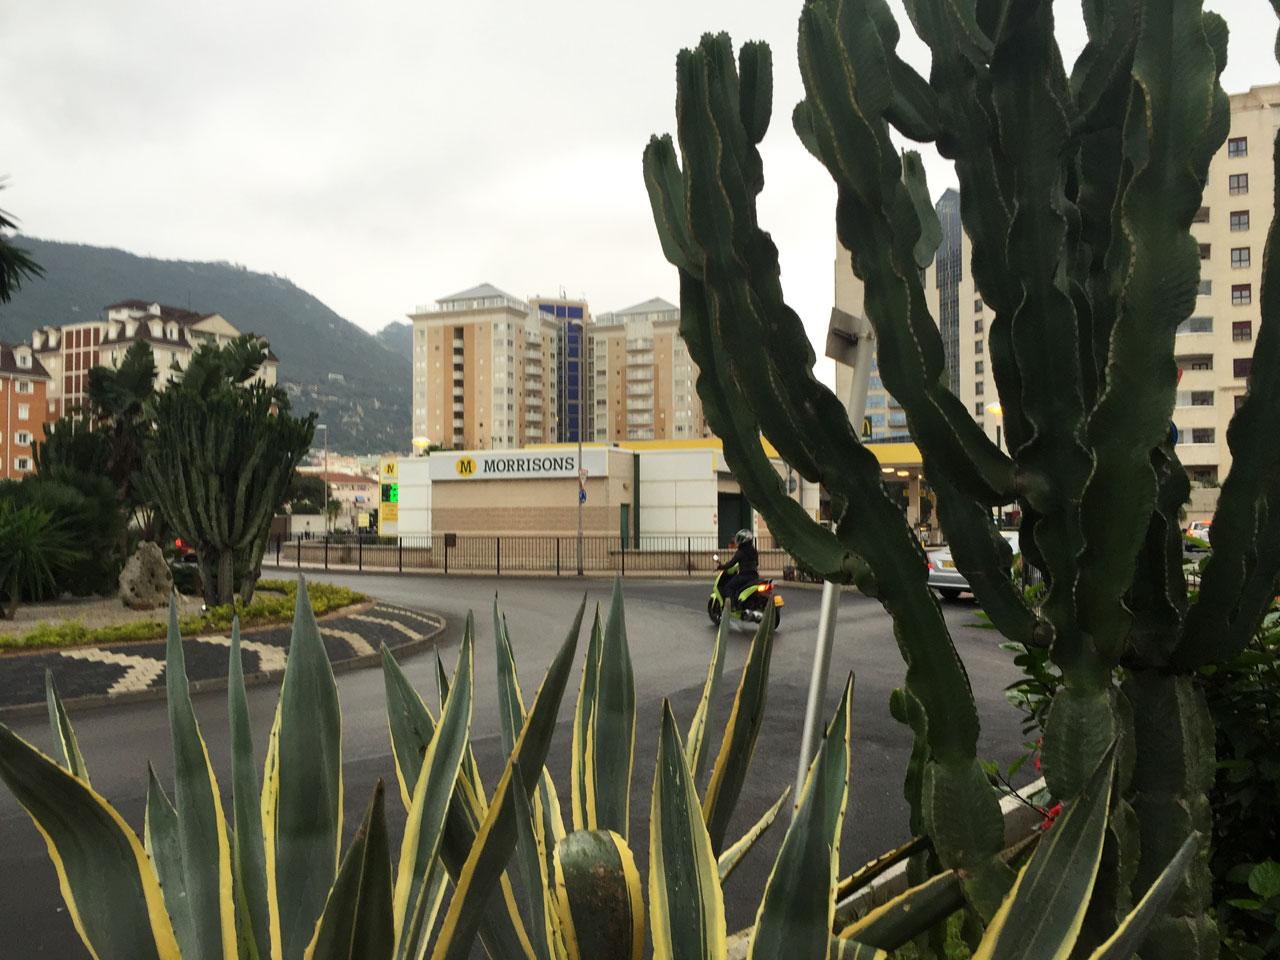 Morrisons supermarket, Gibraltar